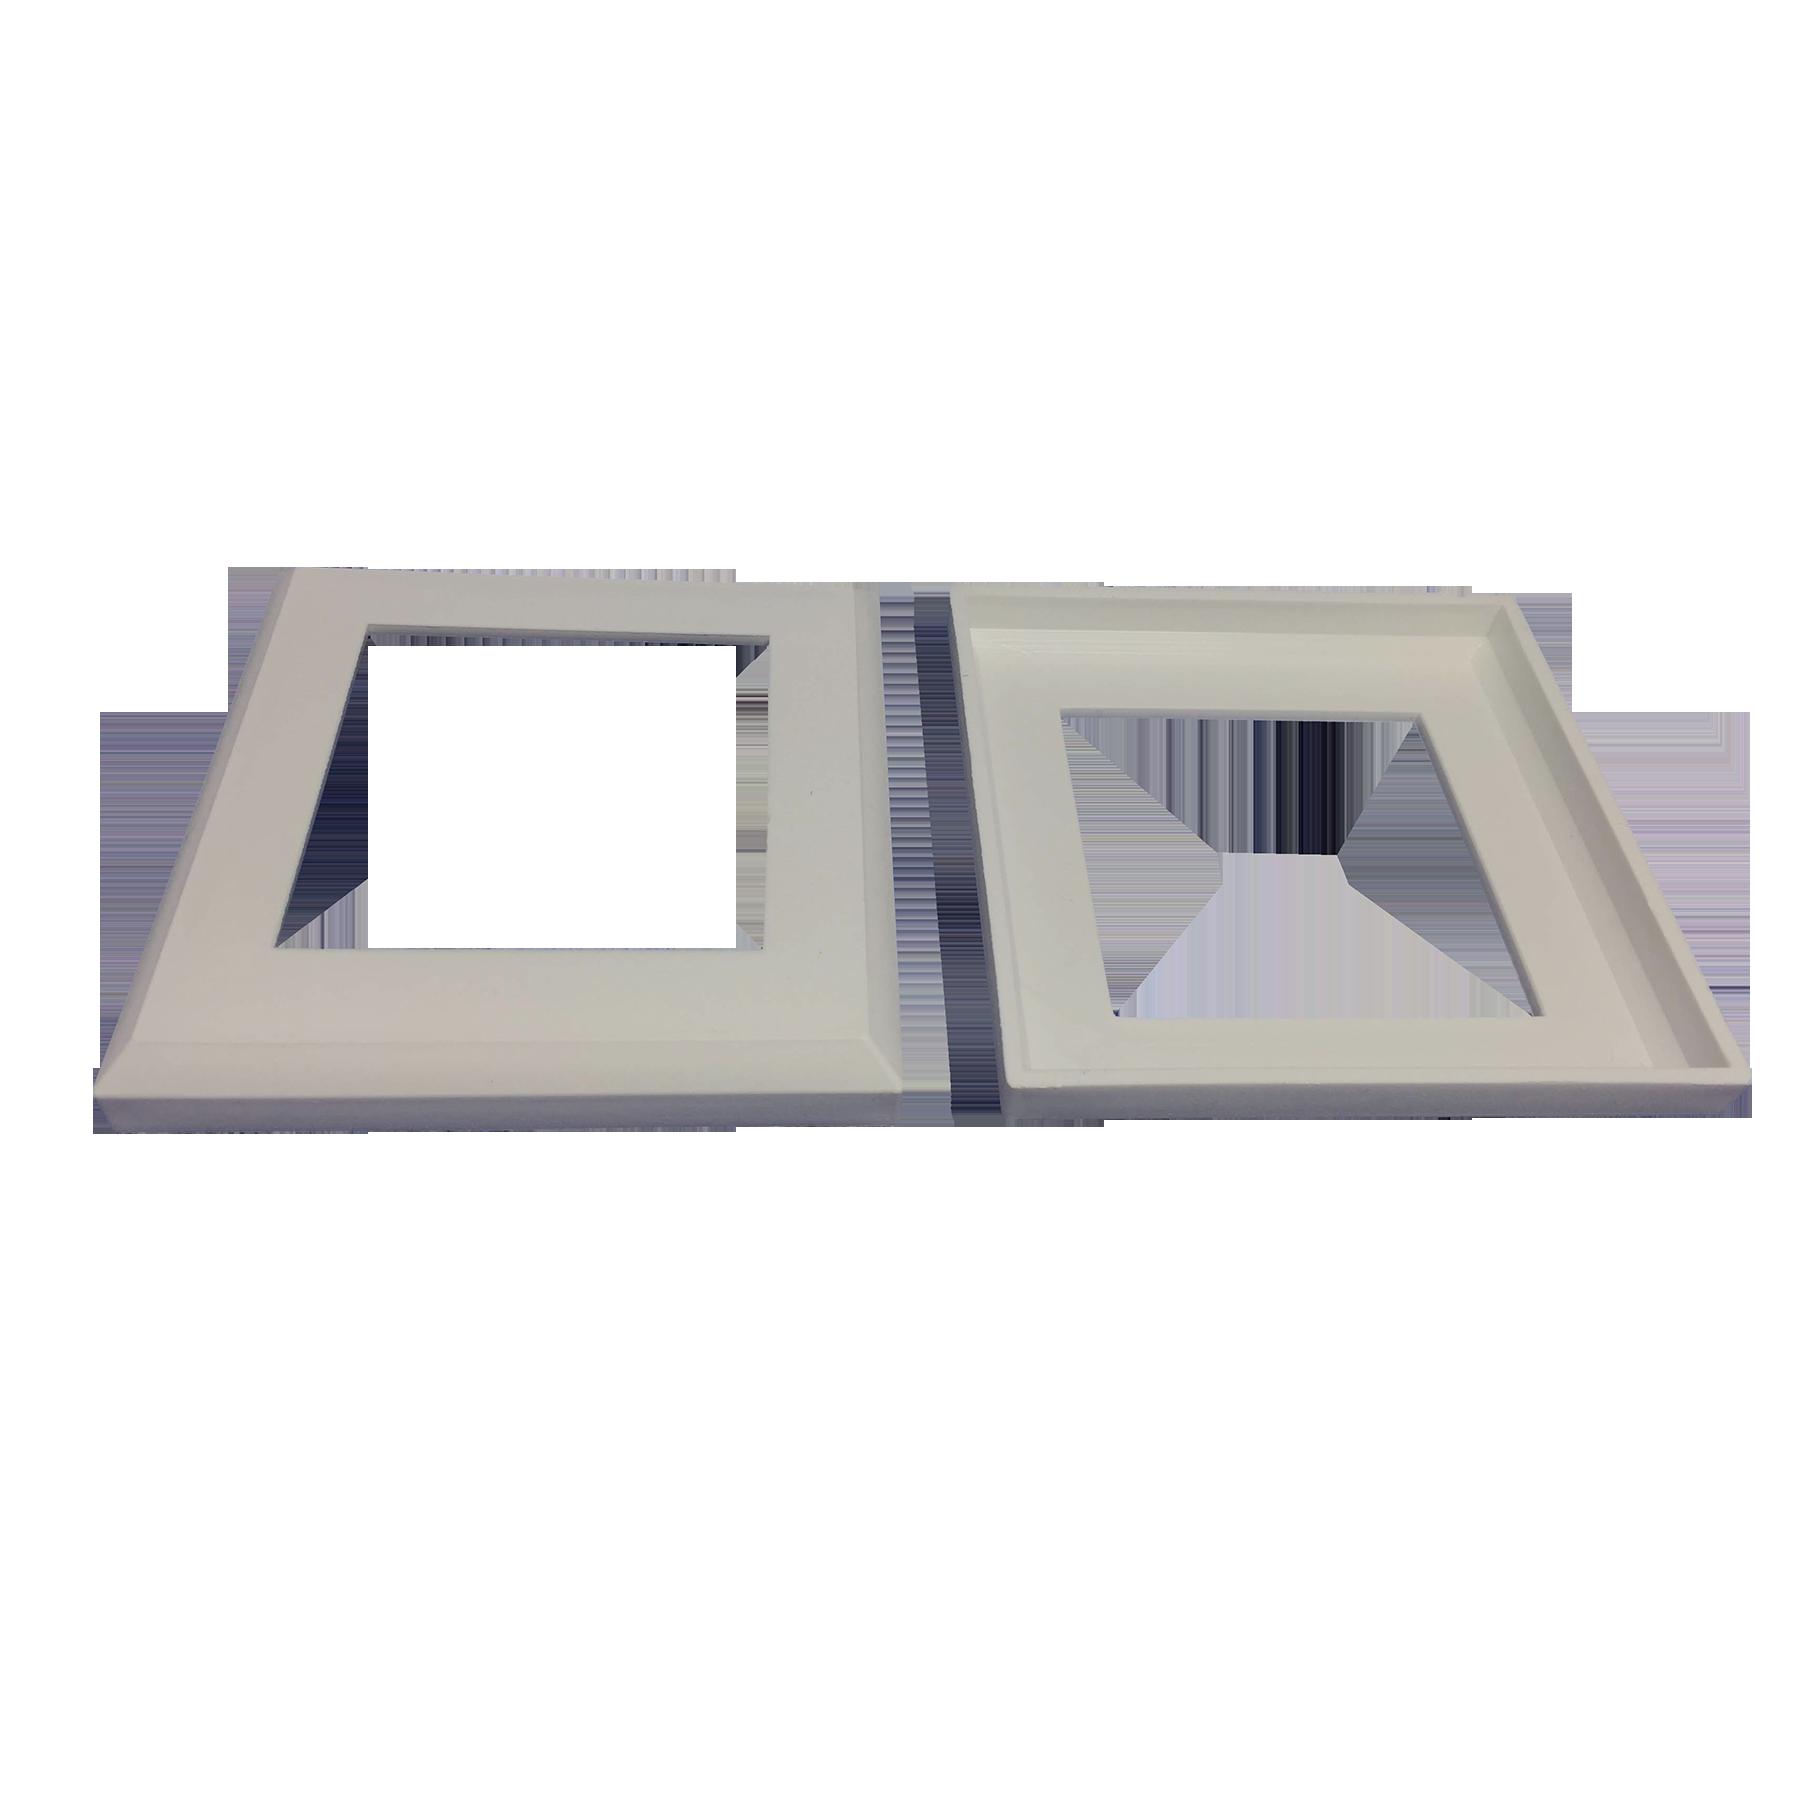 Canopla Quadrada 50 x 50 mm Cinza